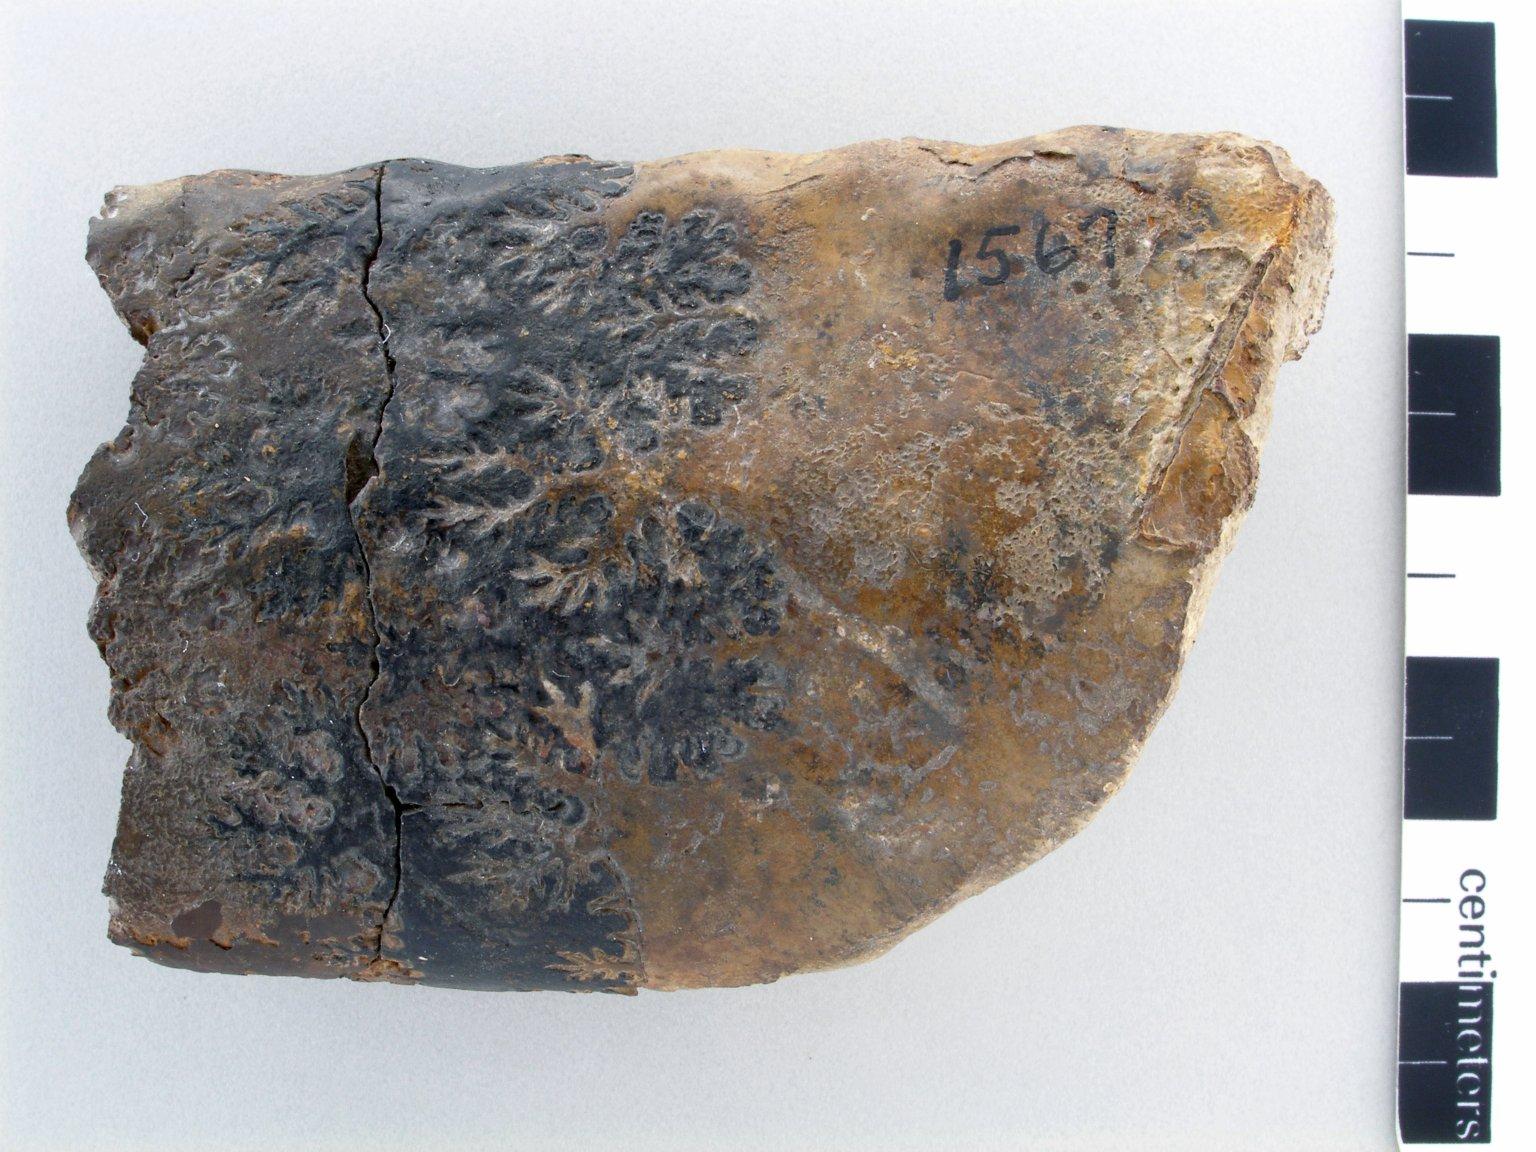 Baculites compressus var. corrugatus (Elias, n. var.)